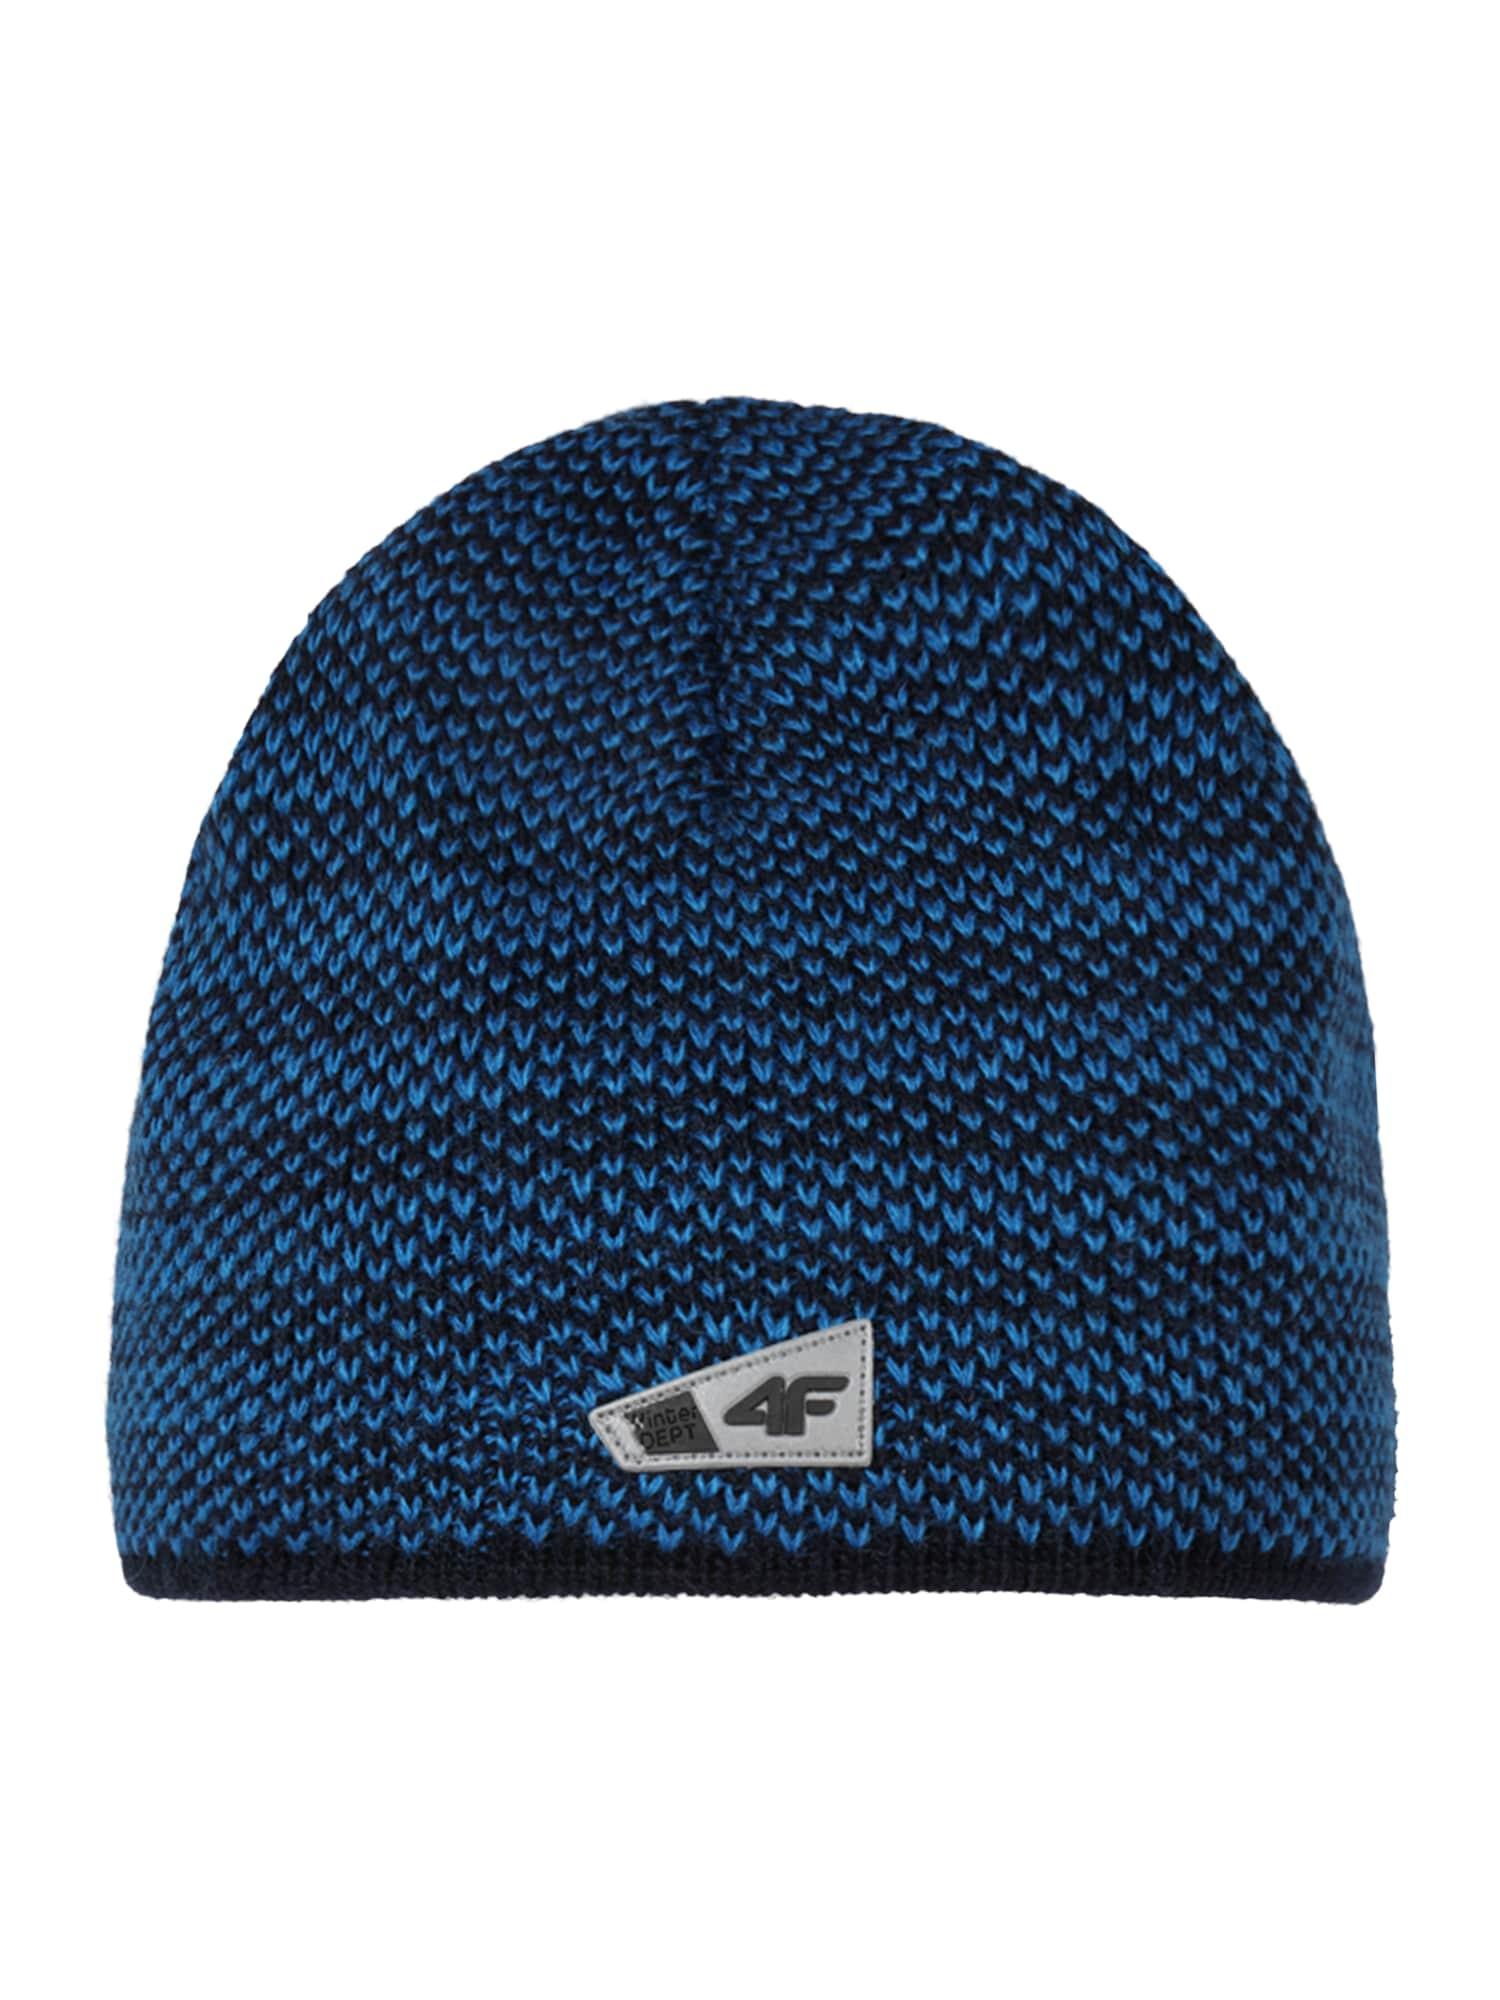 4F Sportmössa  marinblå / svart